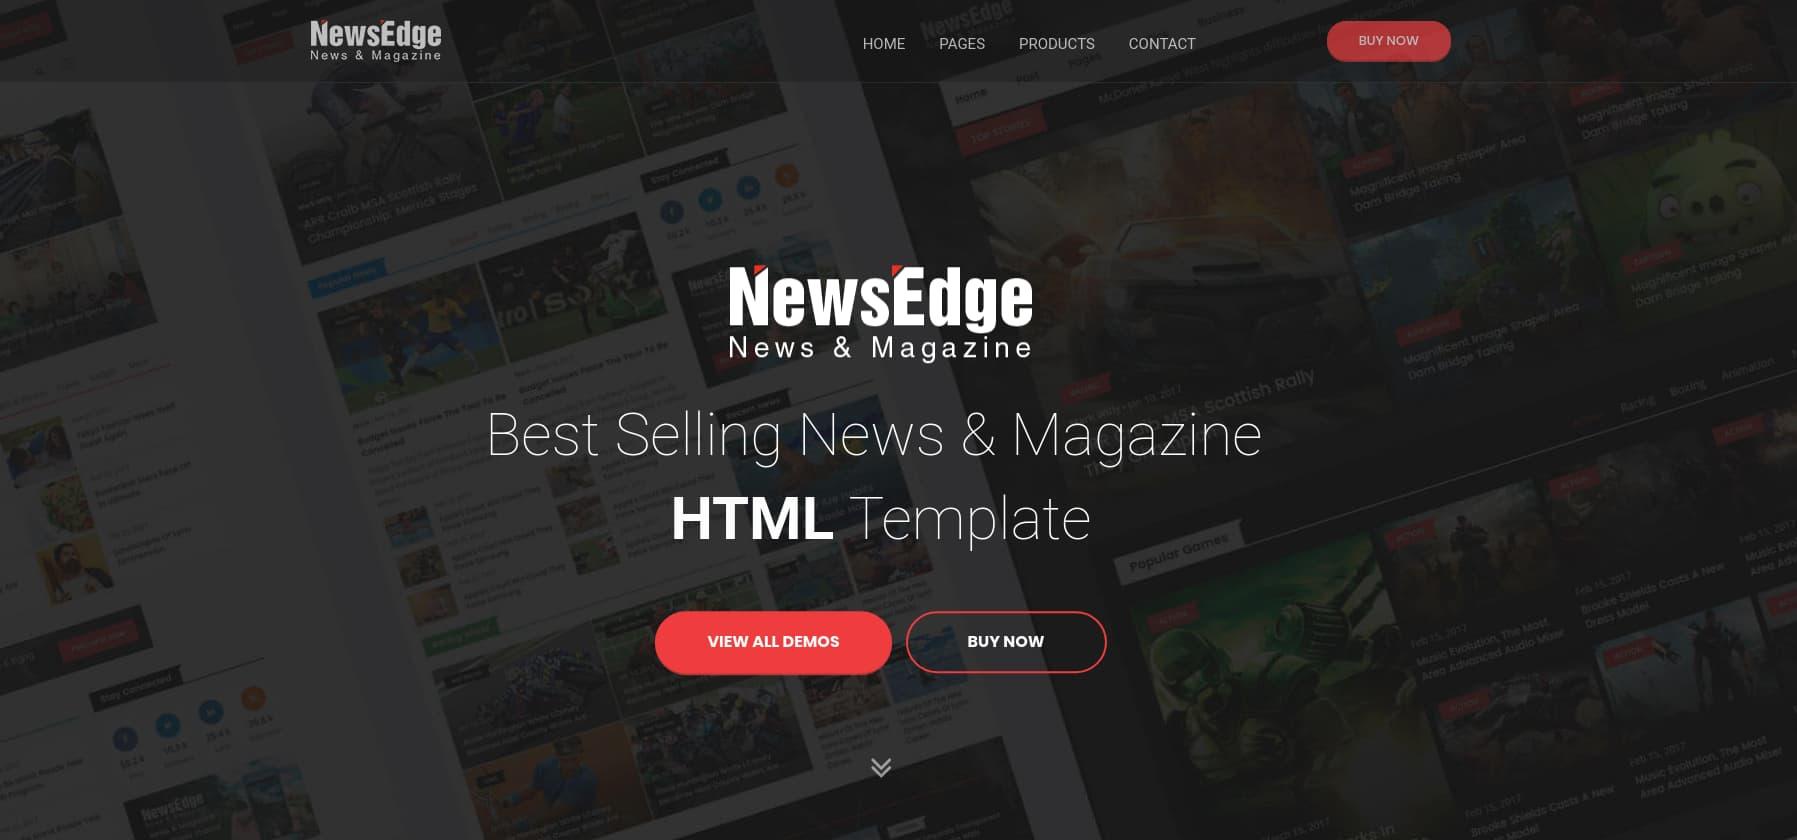 newsedge